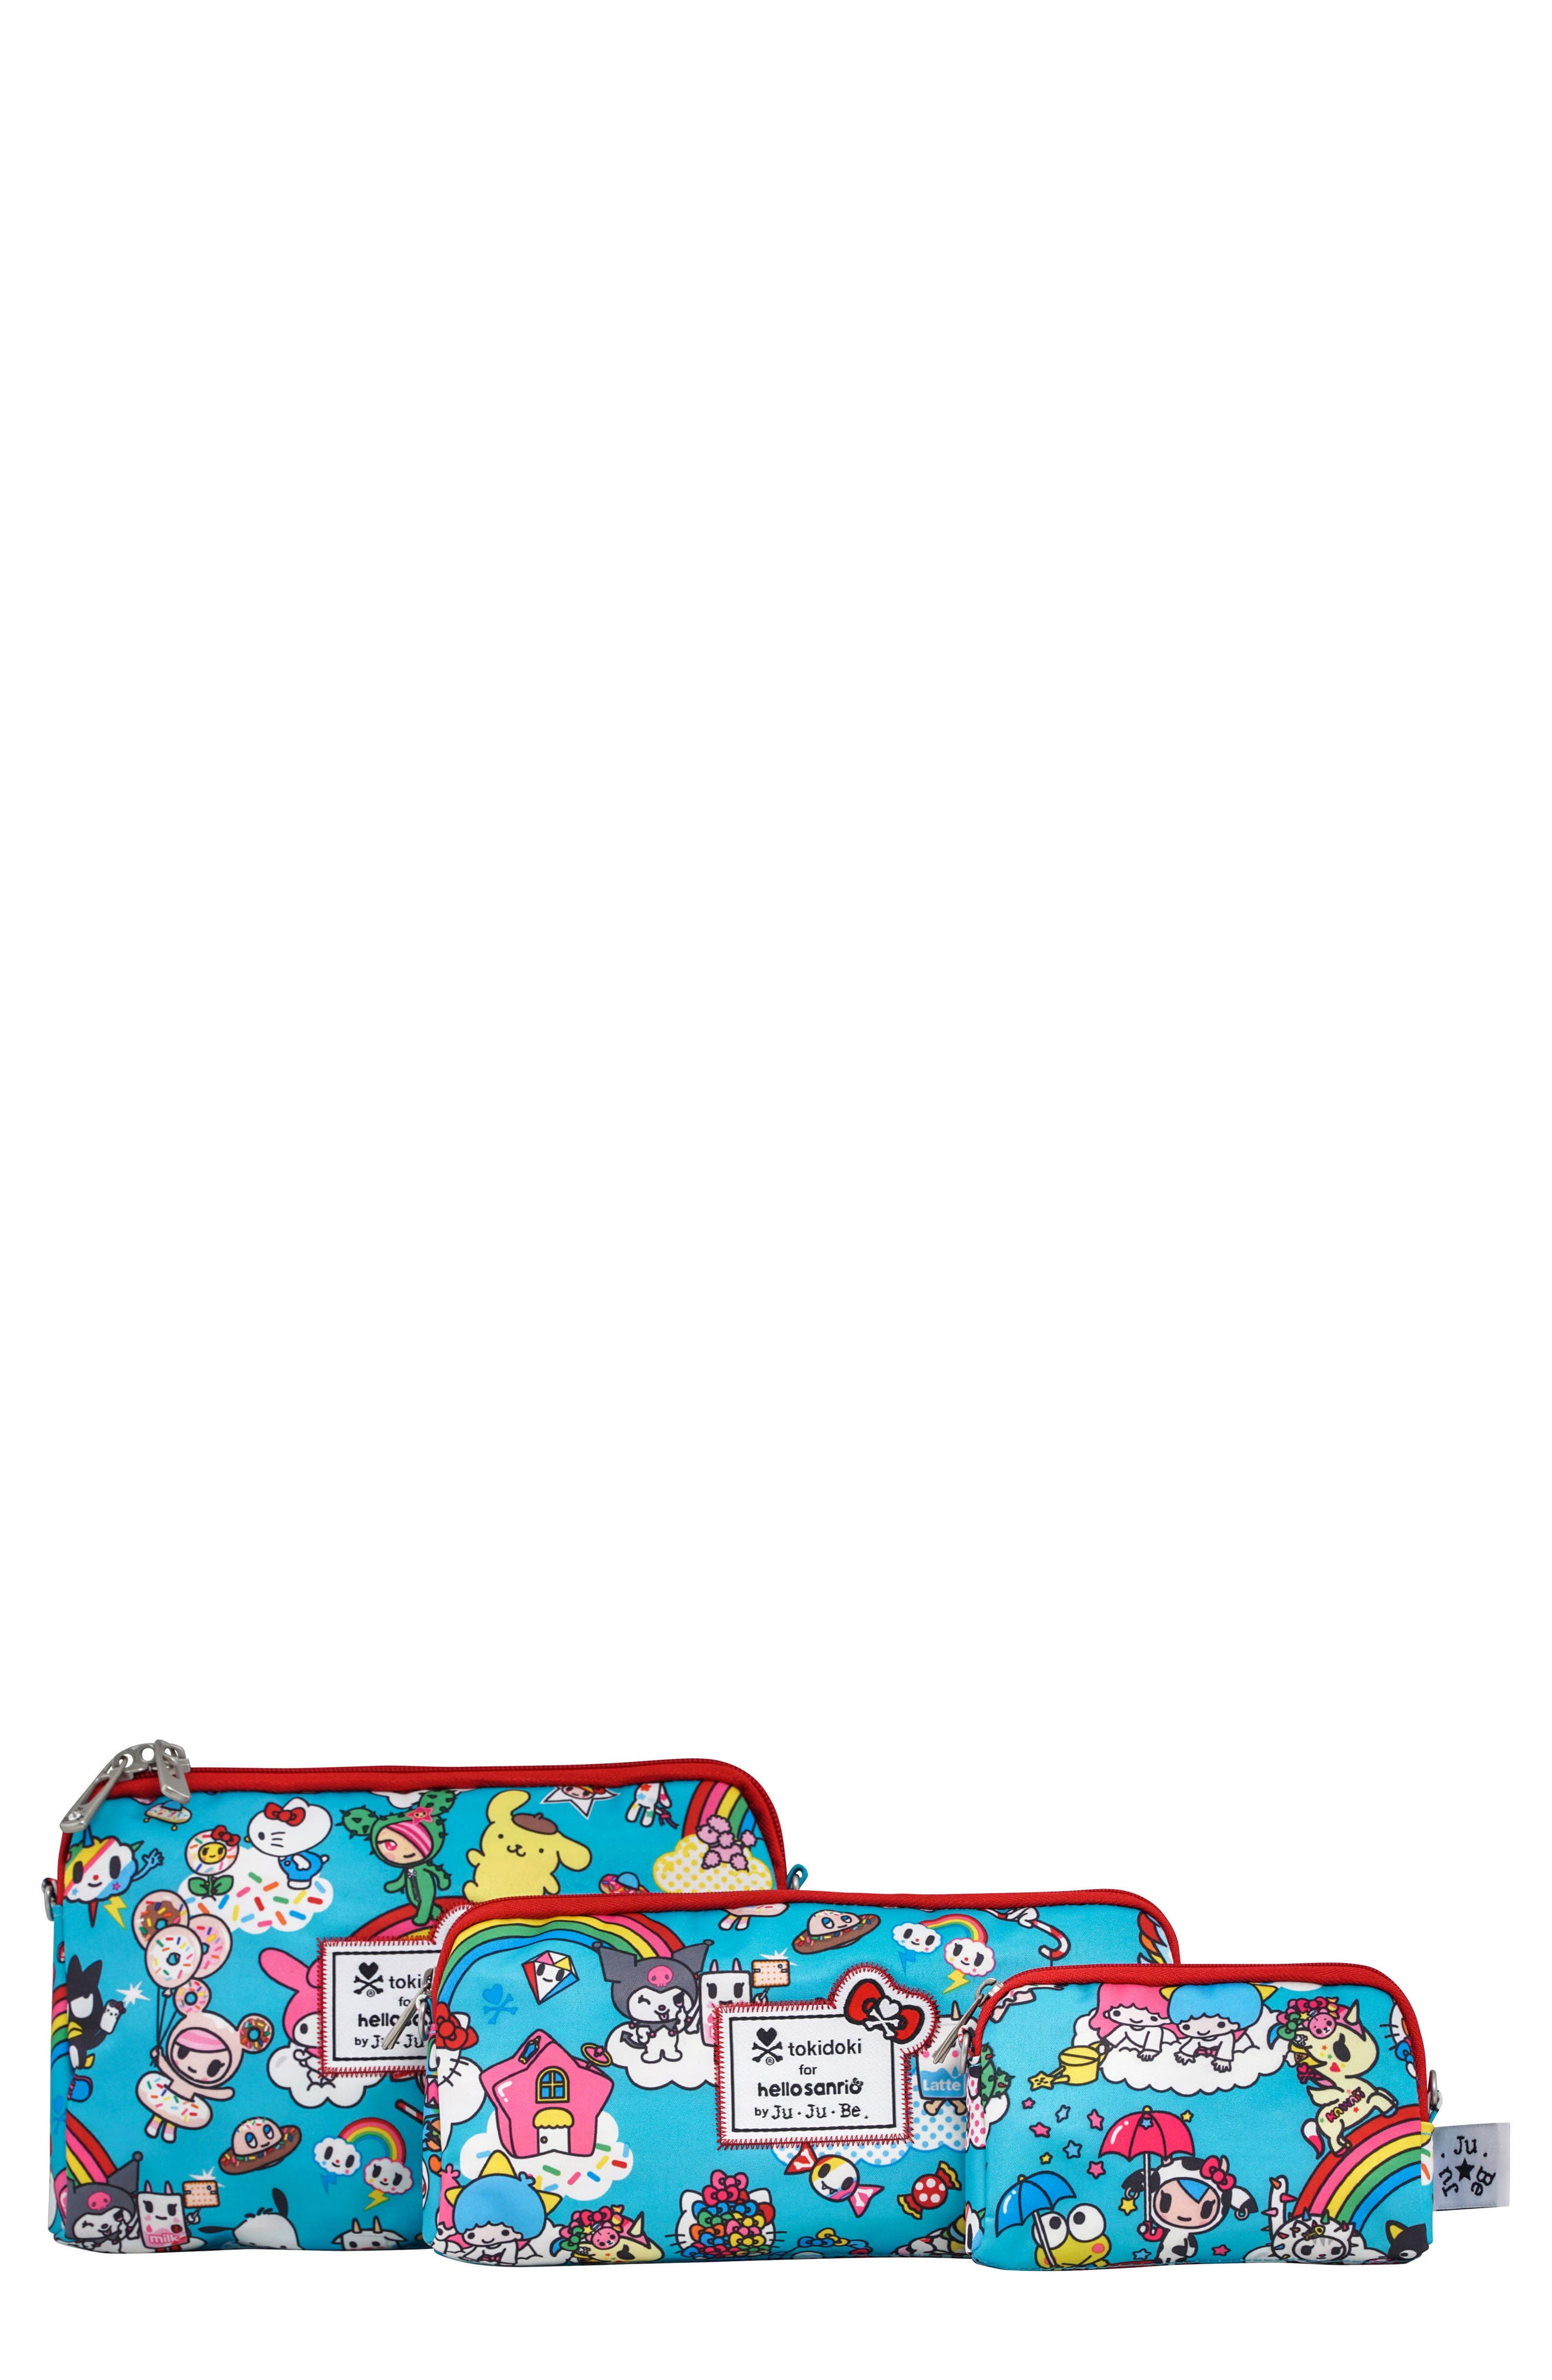 x tokidoki for Hello Sanrio Rainbow Dreams Be Organized Set of 3 Top Zip Cases,                             Main thumbnail 1, color,                             433